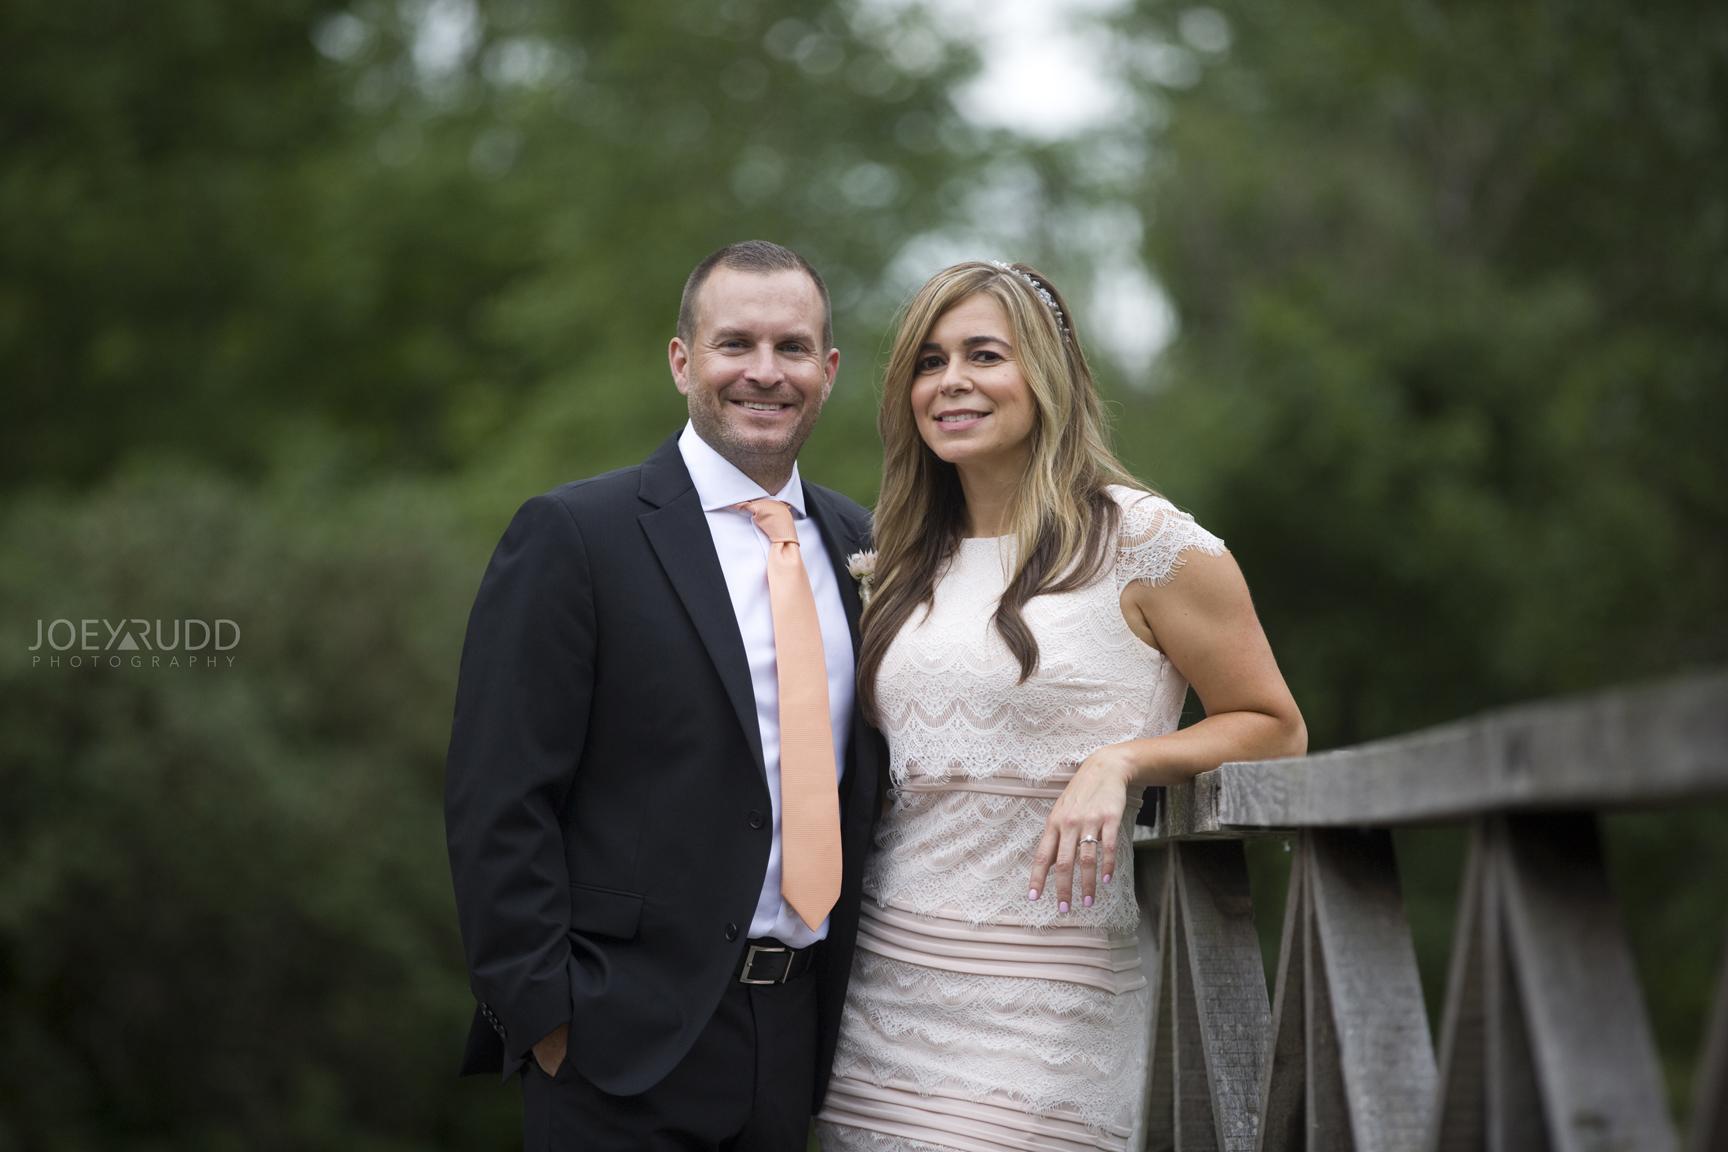 Elopement Wedding by Ottawa Wedding Photographer Joey Rudd Photography Arboretum Bride Smiling